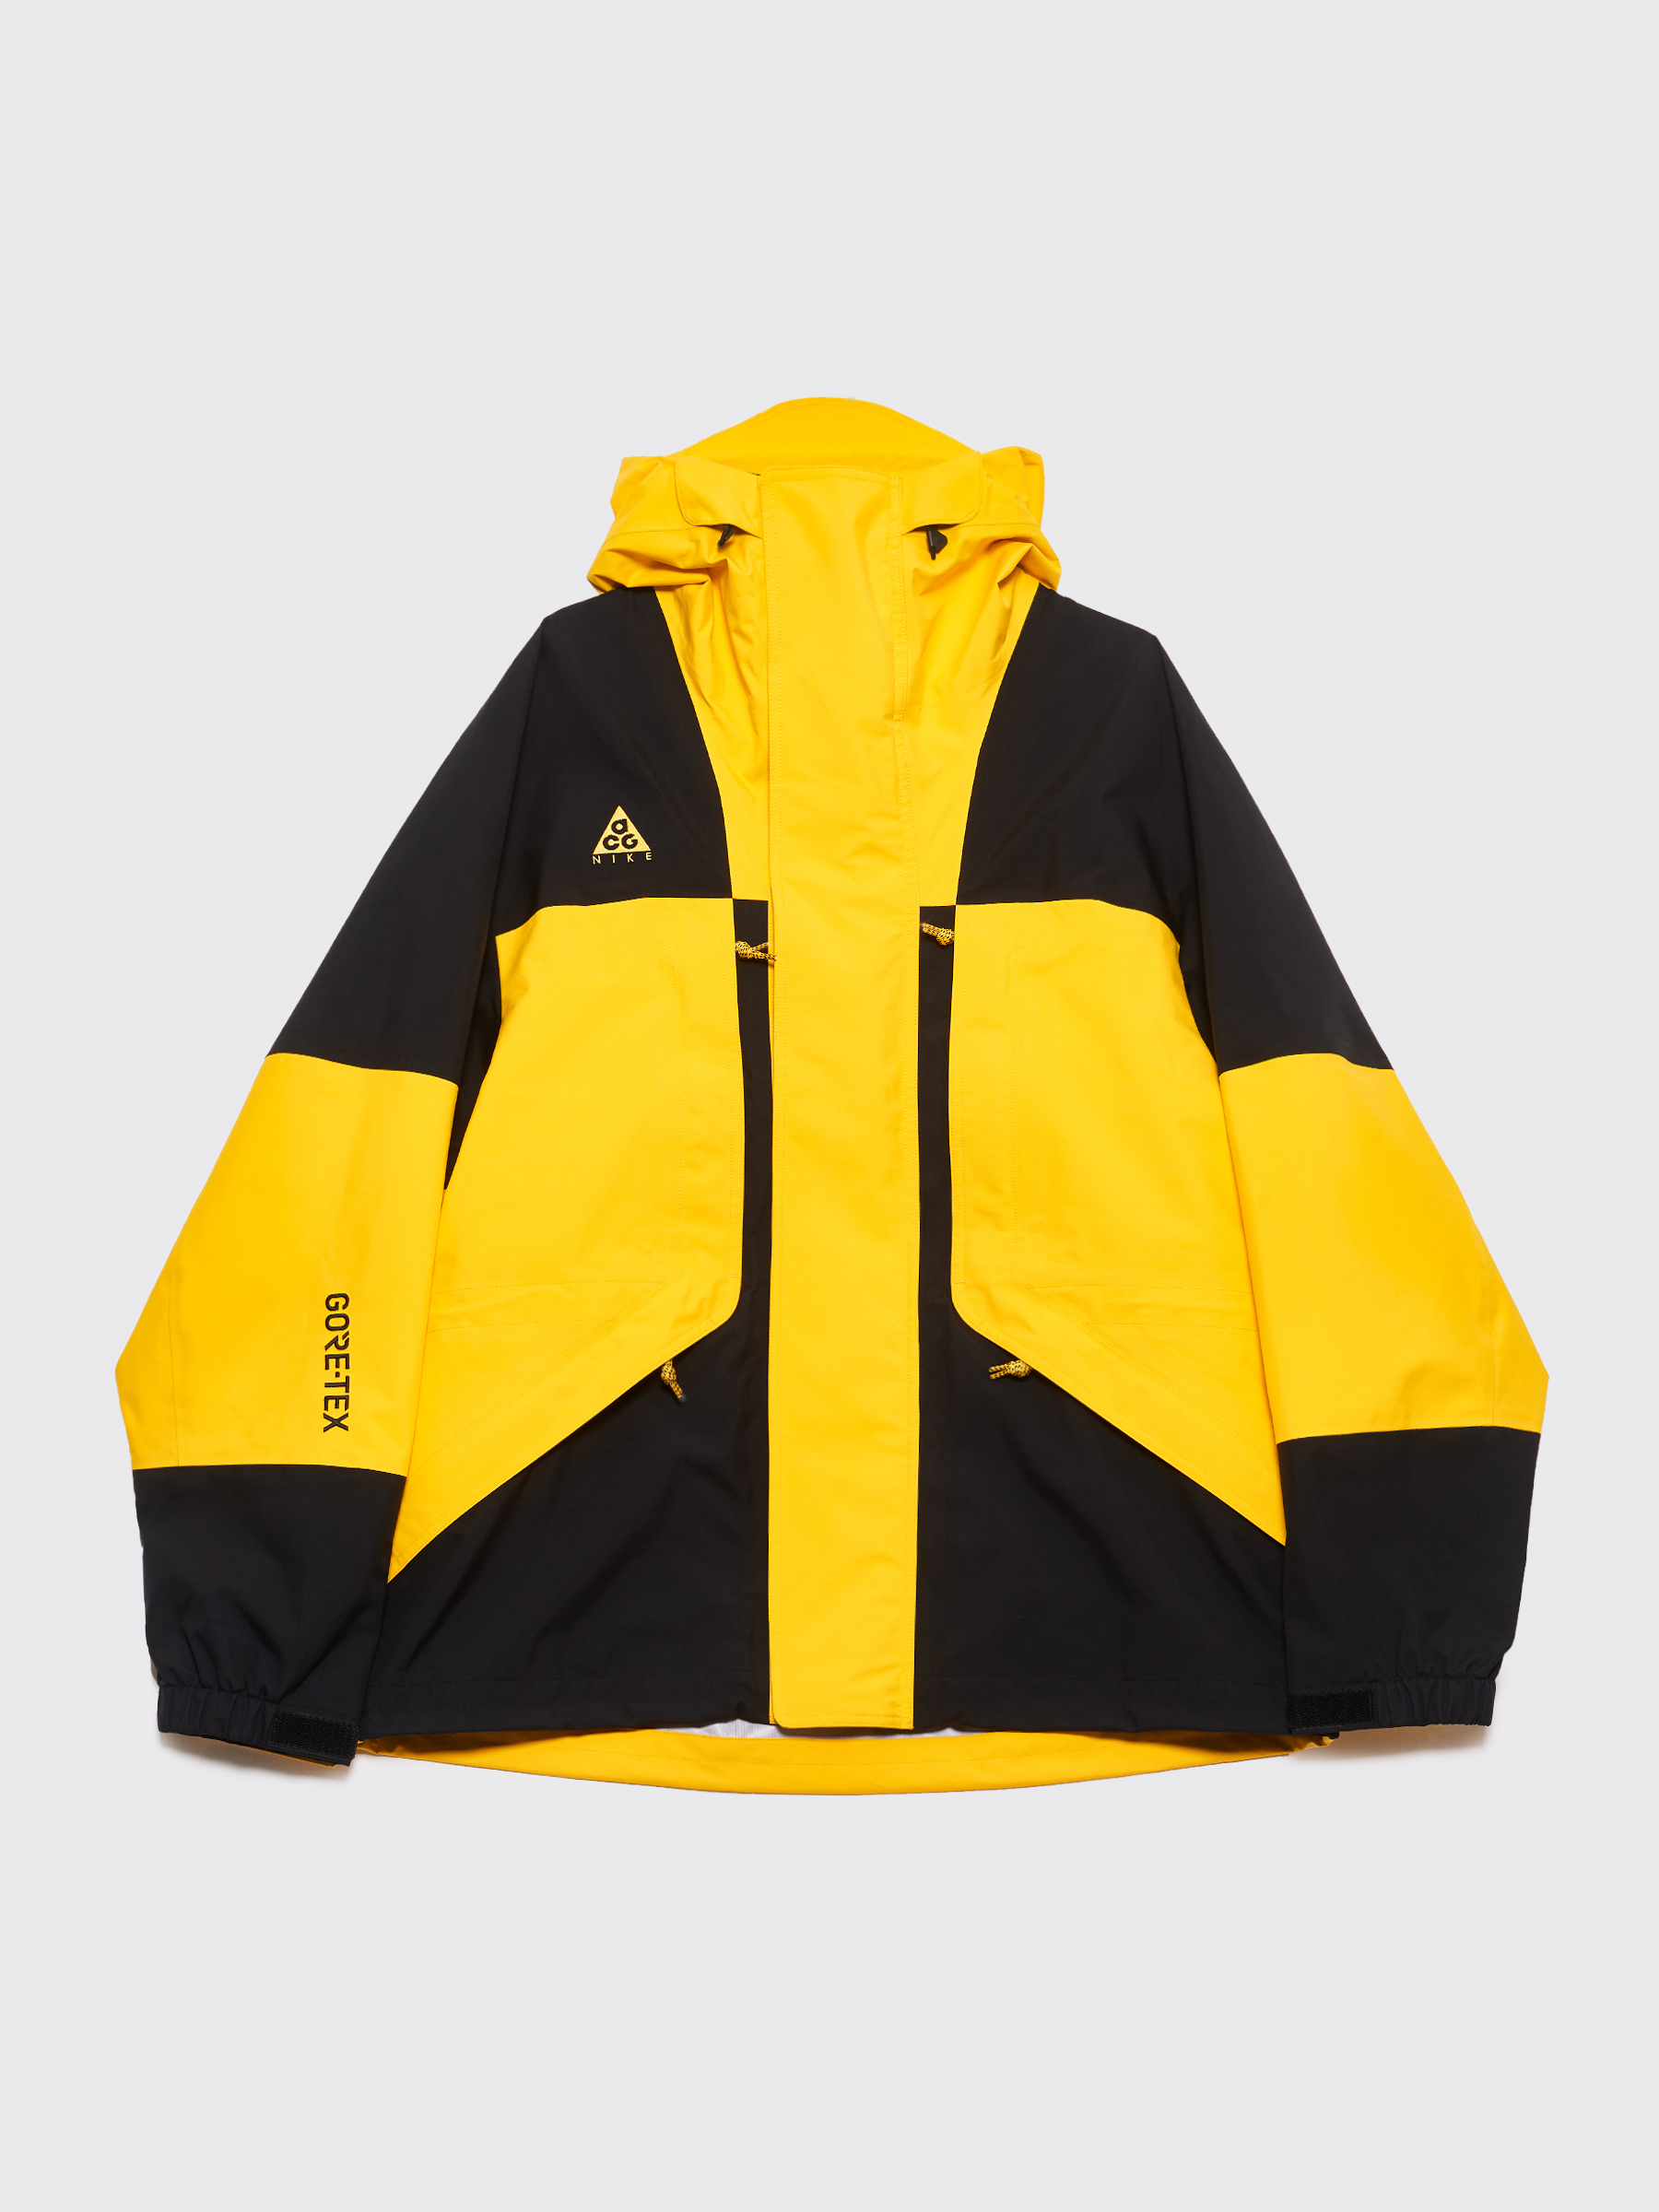 a9481d1ff2 Très Bien - Nike ACG Gore-Tex Jacket Amarillo   Black